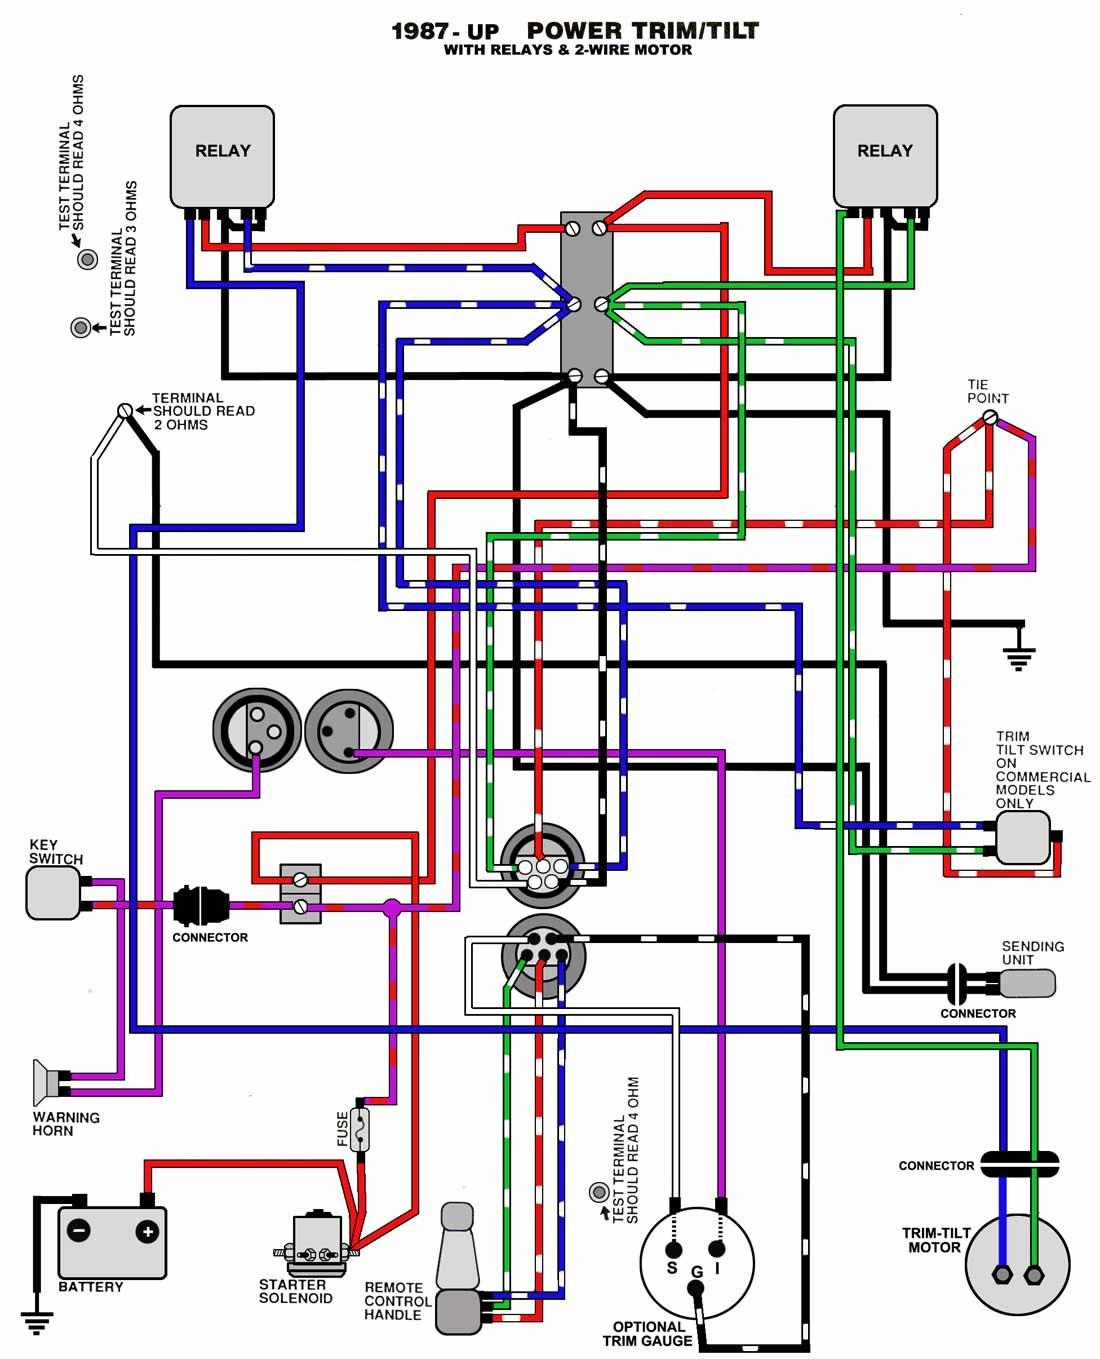 Suzuki Outboard Ignition Switch Wiring Diagram Collection Wiring Diagram Mercury 115 Hp Outboard LVcSWOP Prepossessing